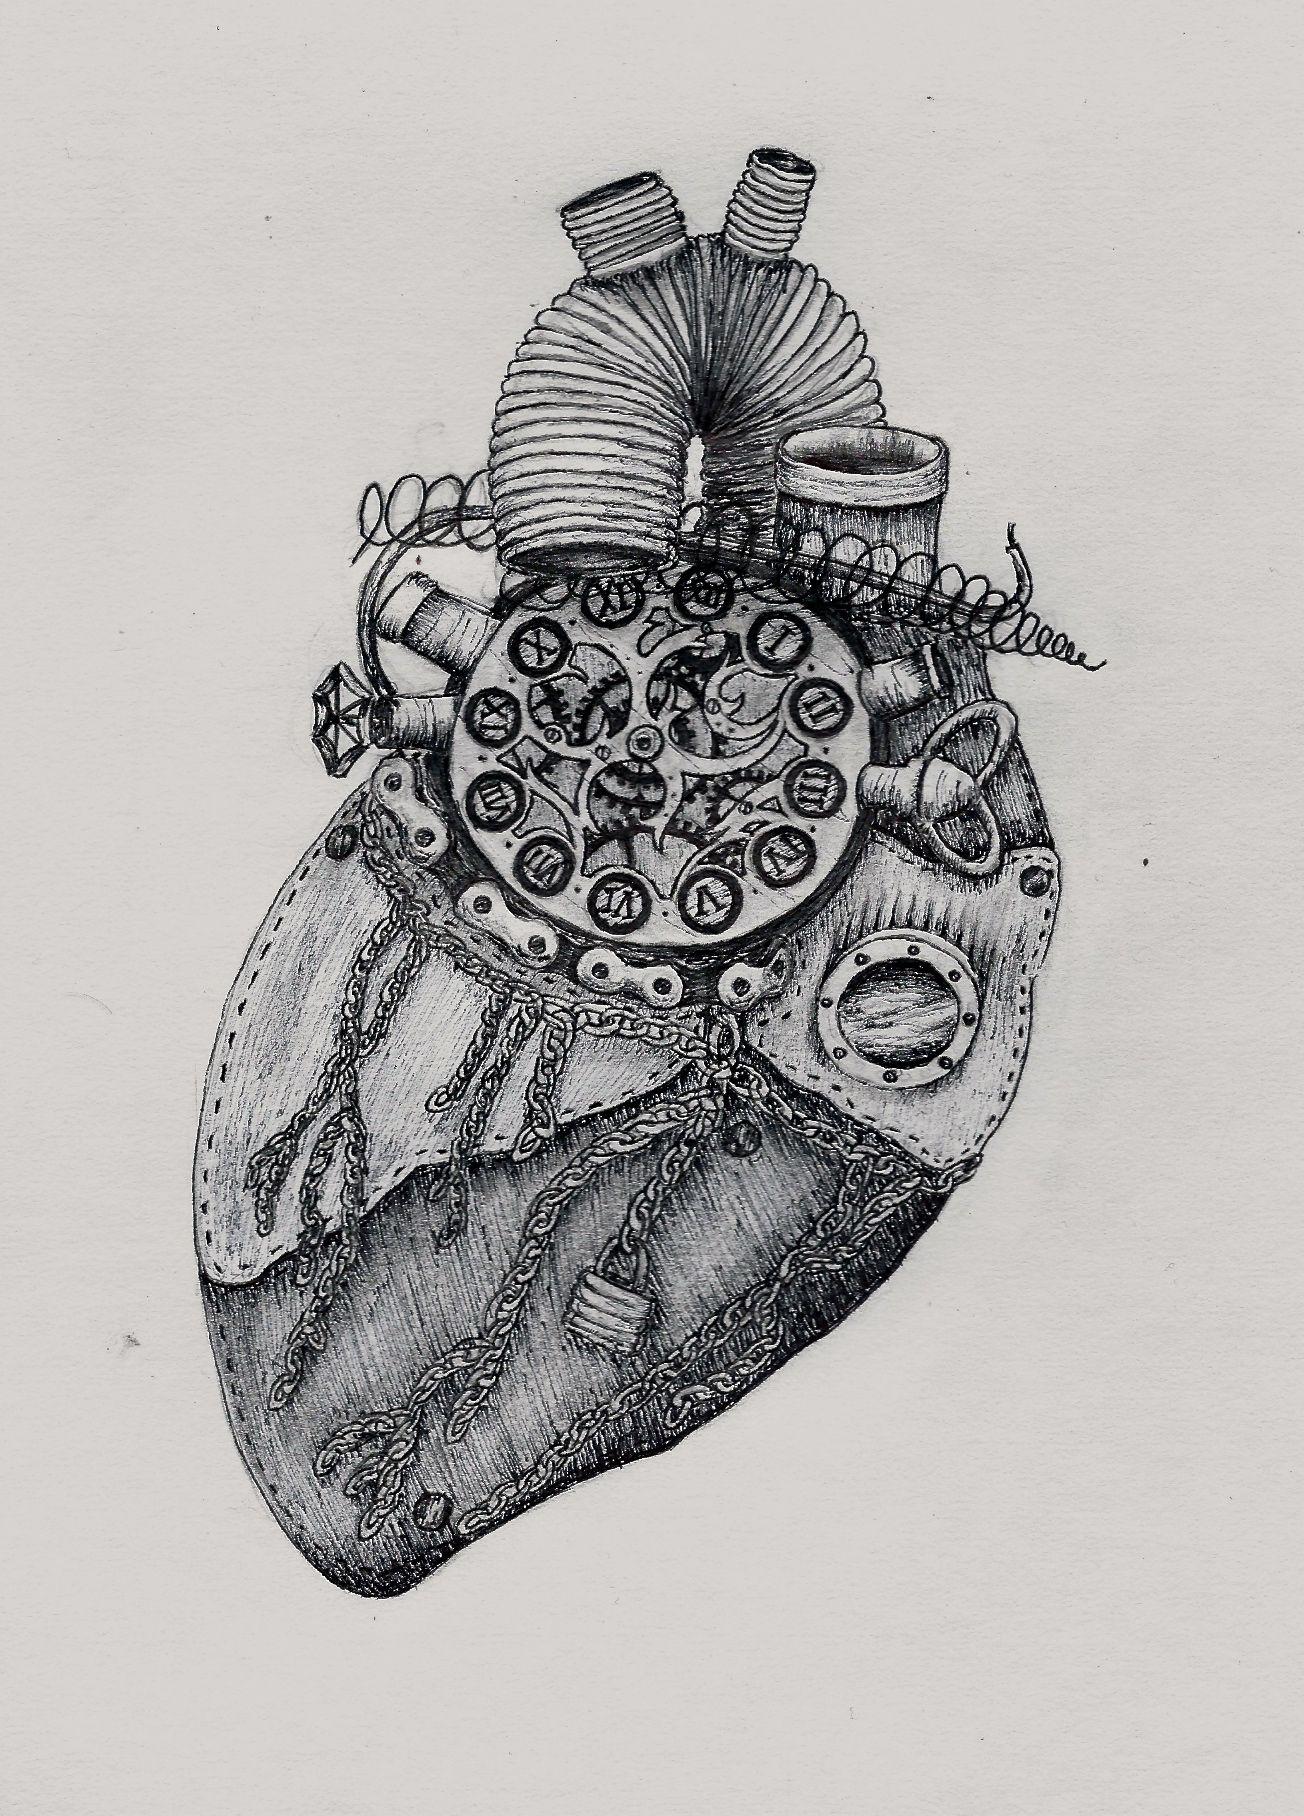 Steampunk Heart Drawing - Google Art Dibujos De